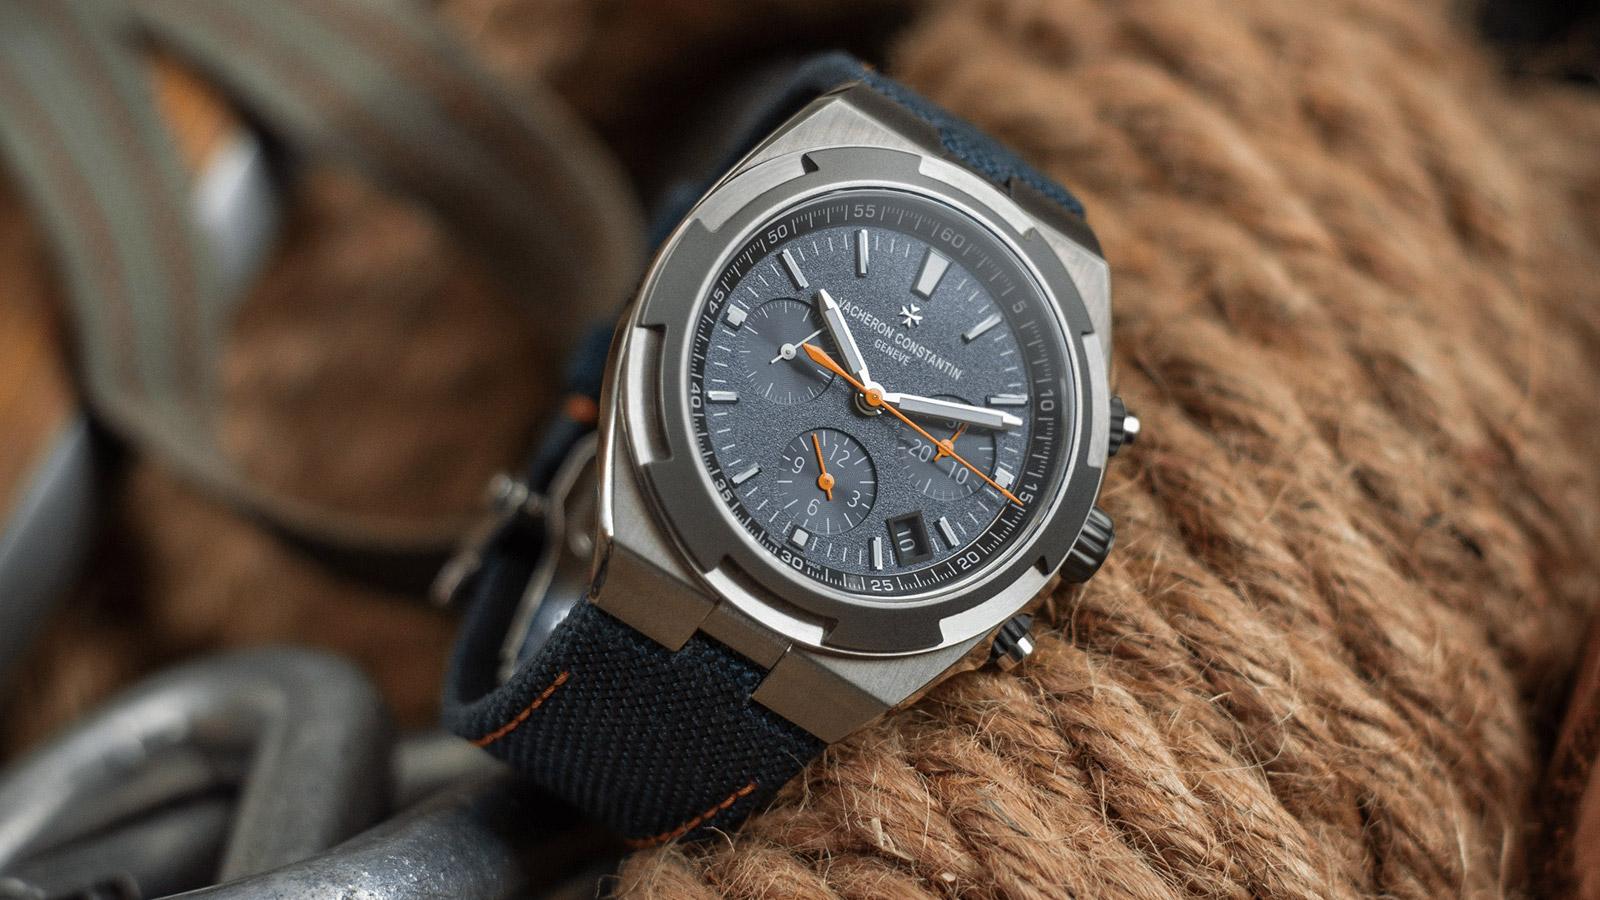 Vacheron Constantin Overseas Everest Chronograph and Overseas Everest Dual Time